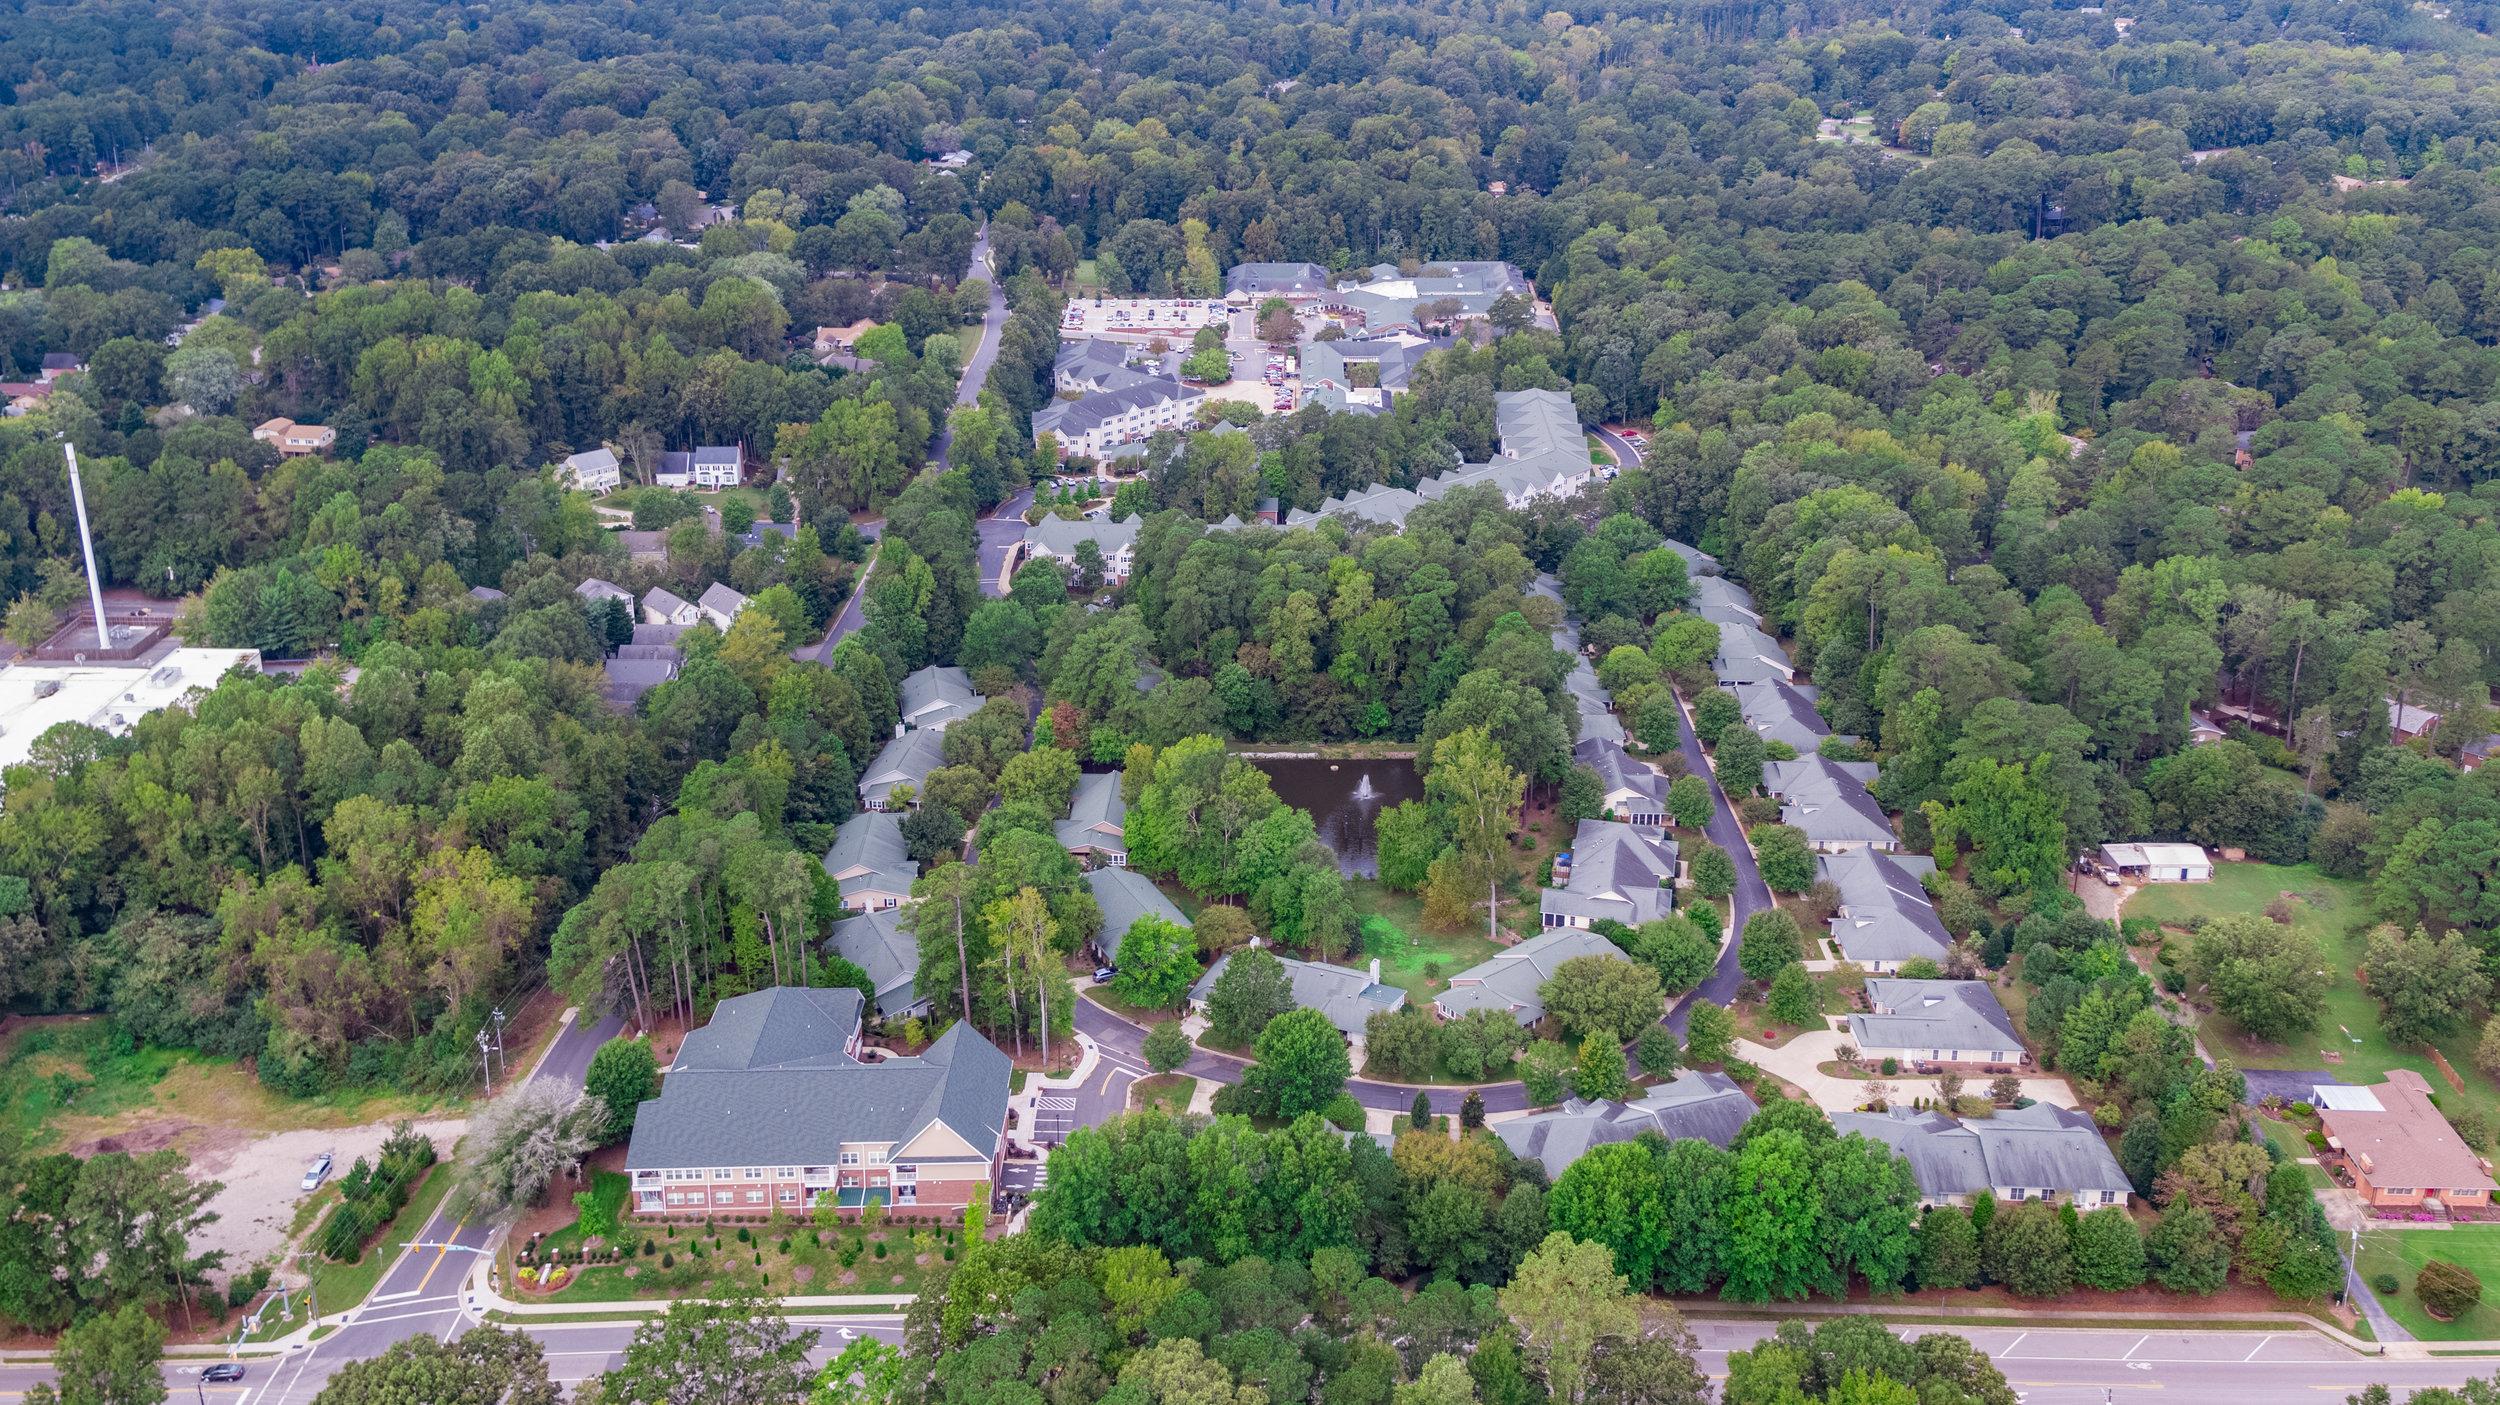 real-estate-photography-drone-photographer-drone-greensboro-nc-triad-216.jpg